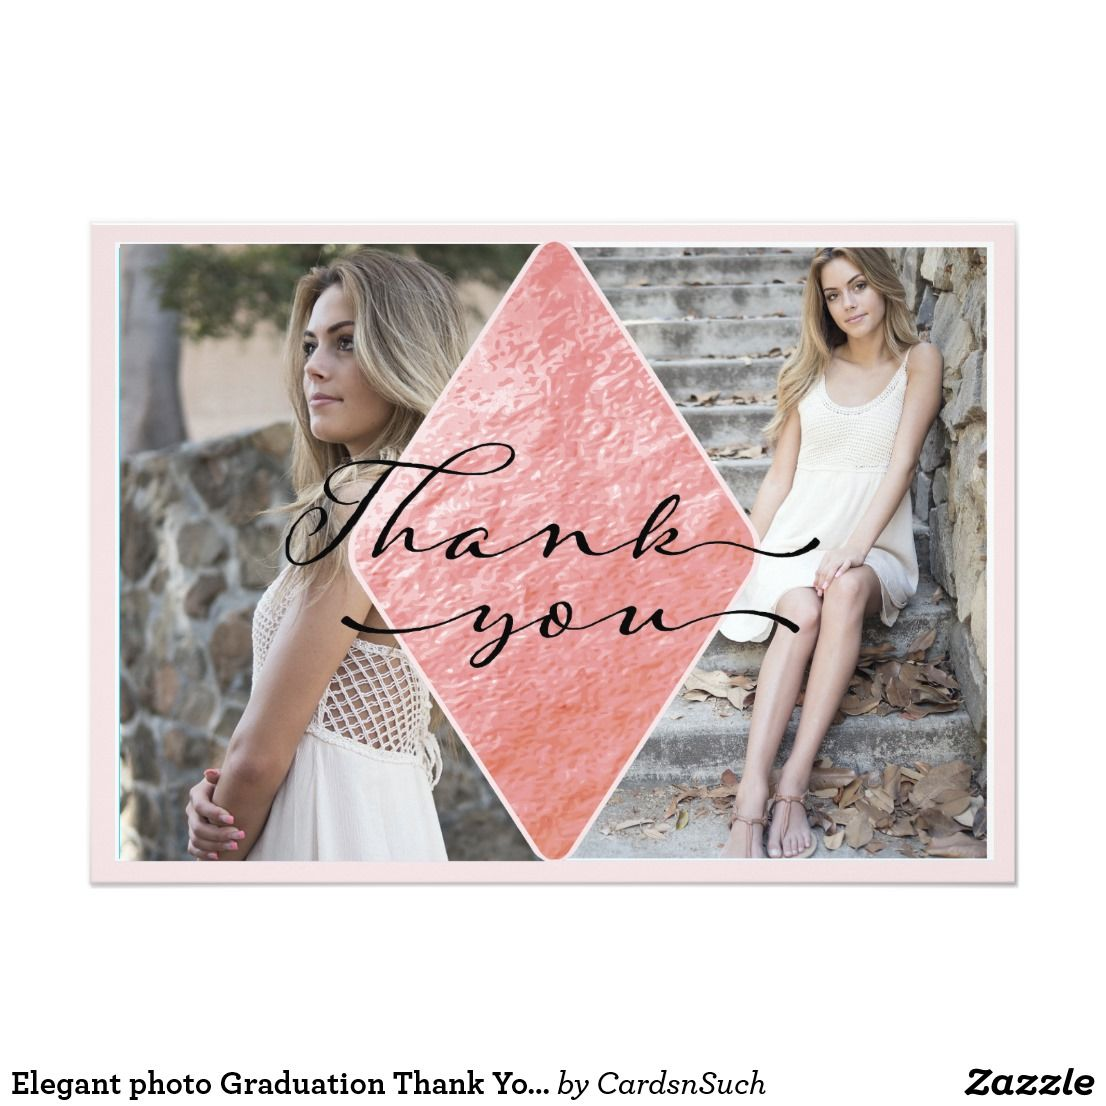 Elegant photo graduation thank you card